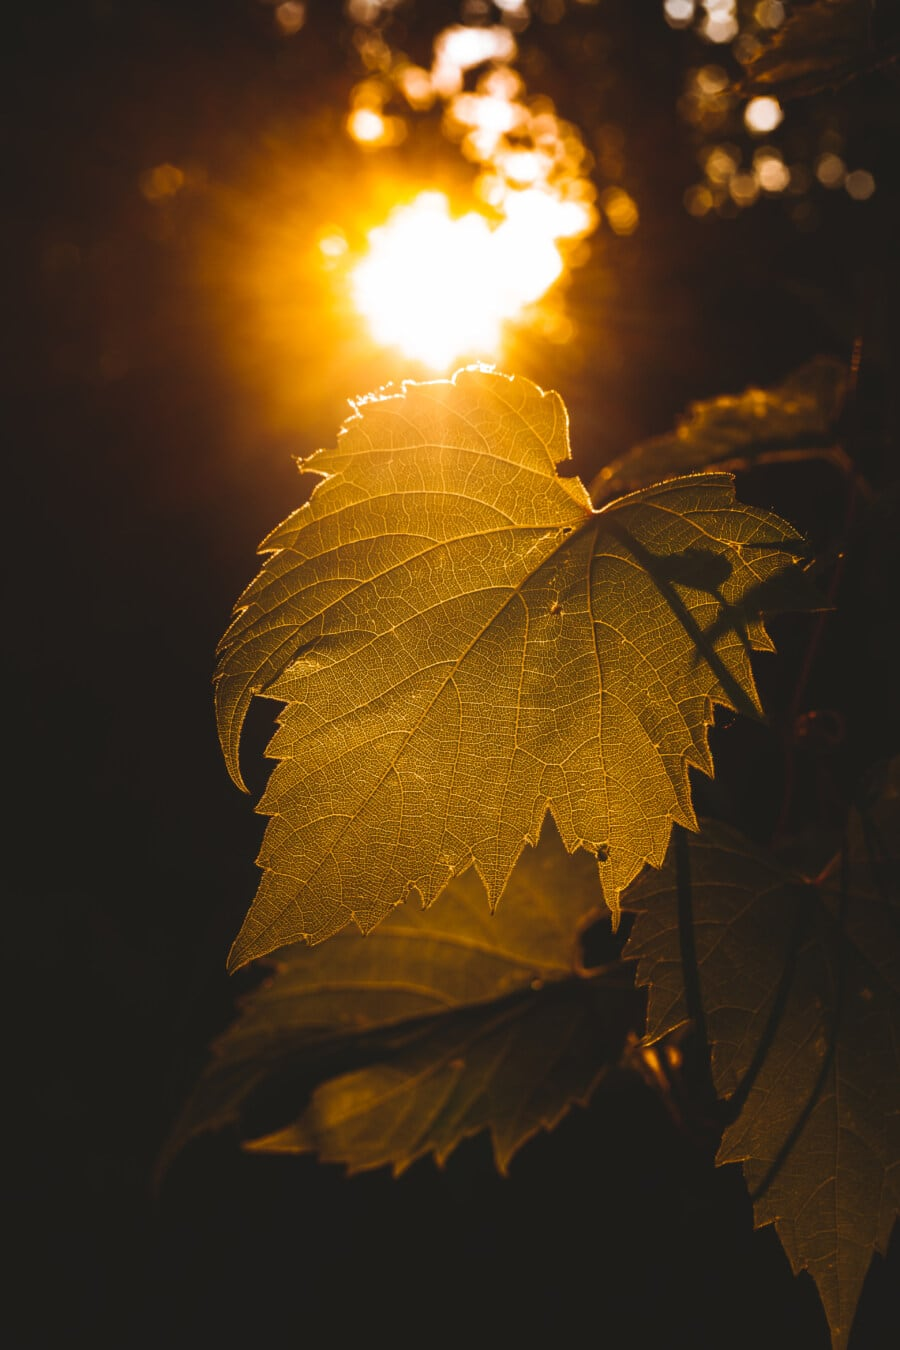 green leaves, sunlight, sun, sunny, sunrays, leaf, nature, sunset, light, bright